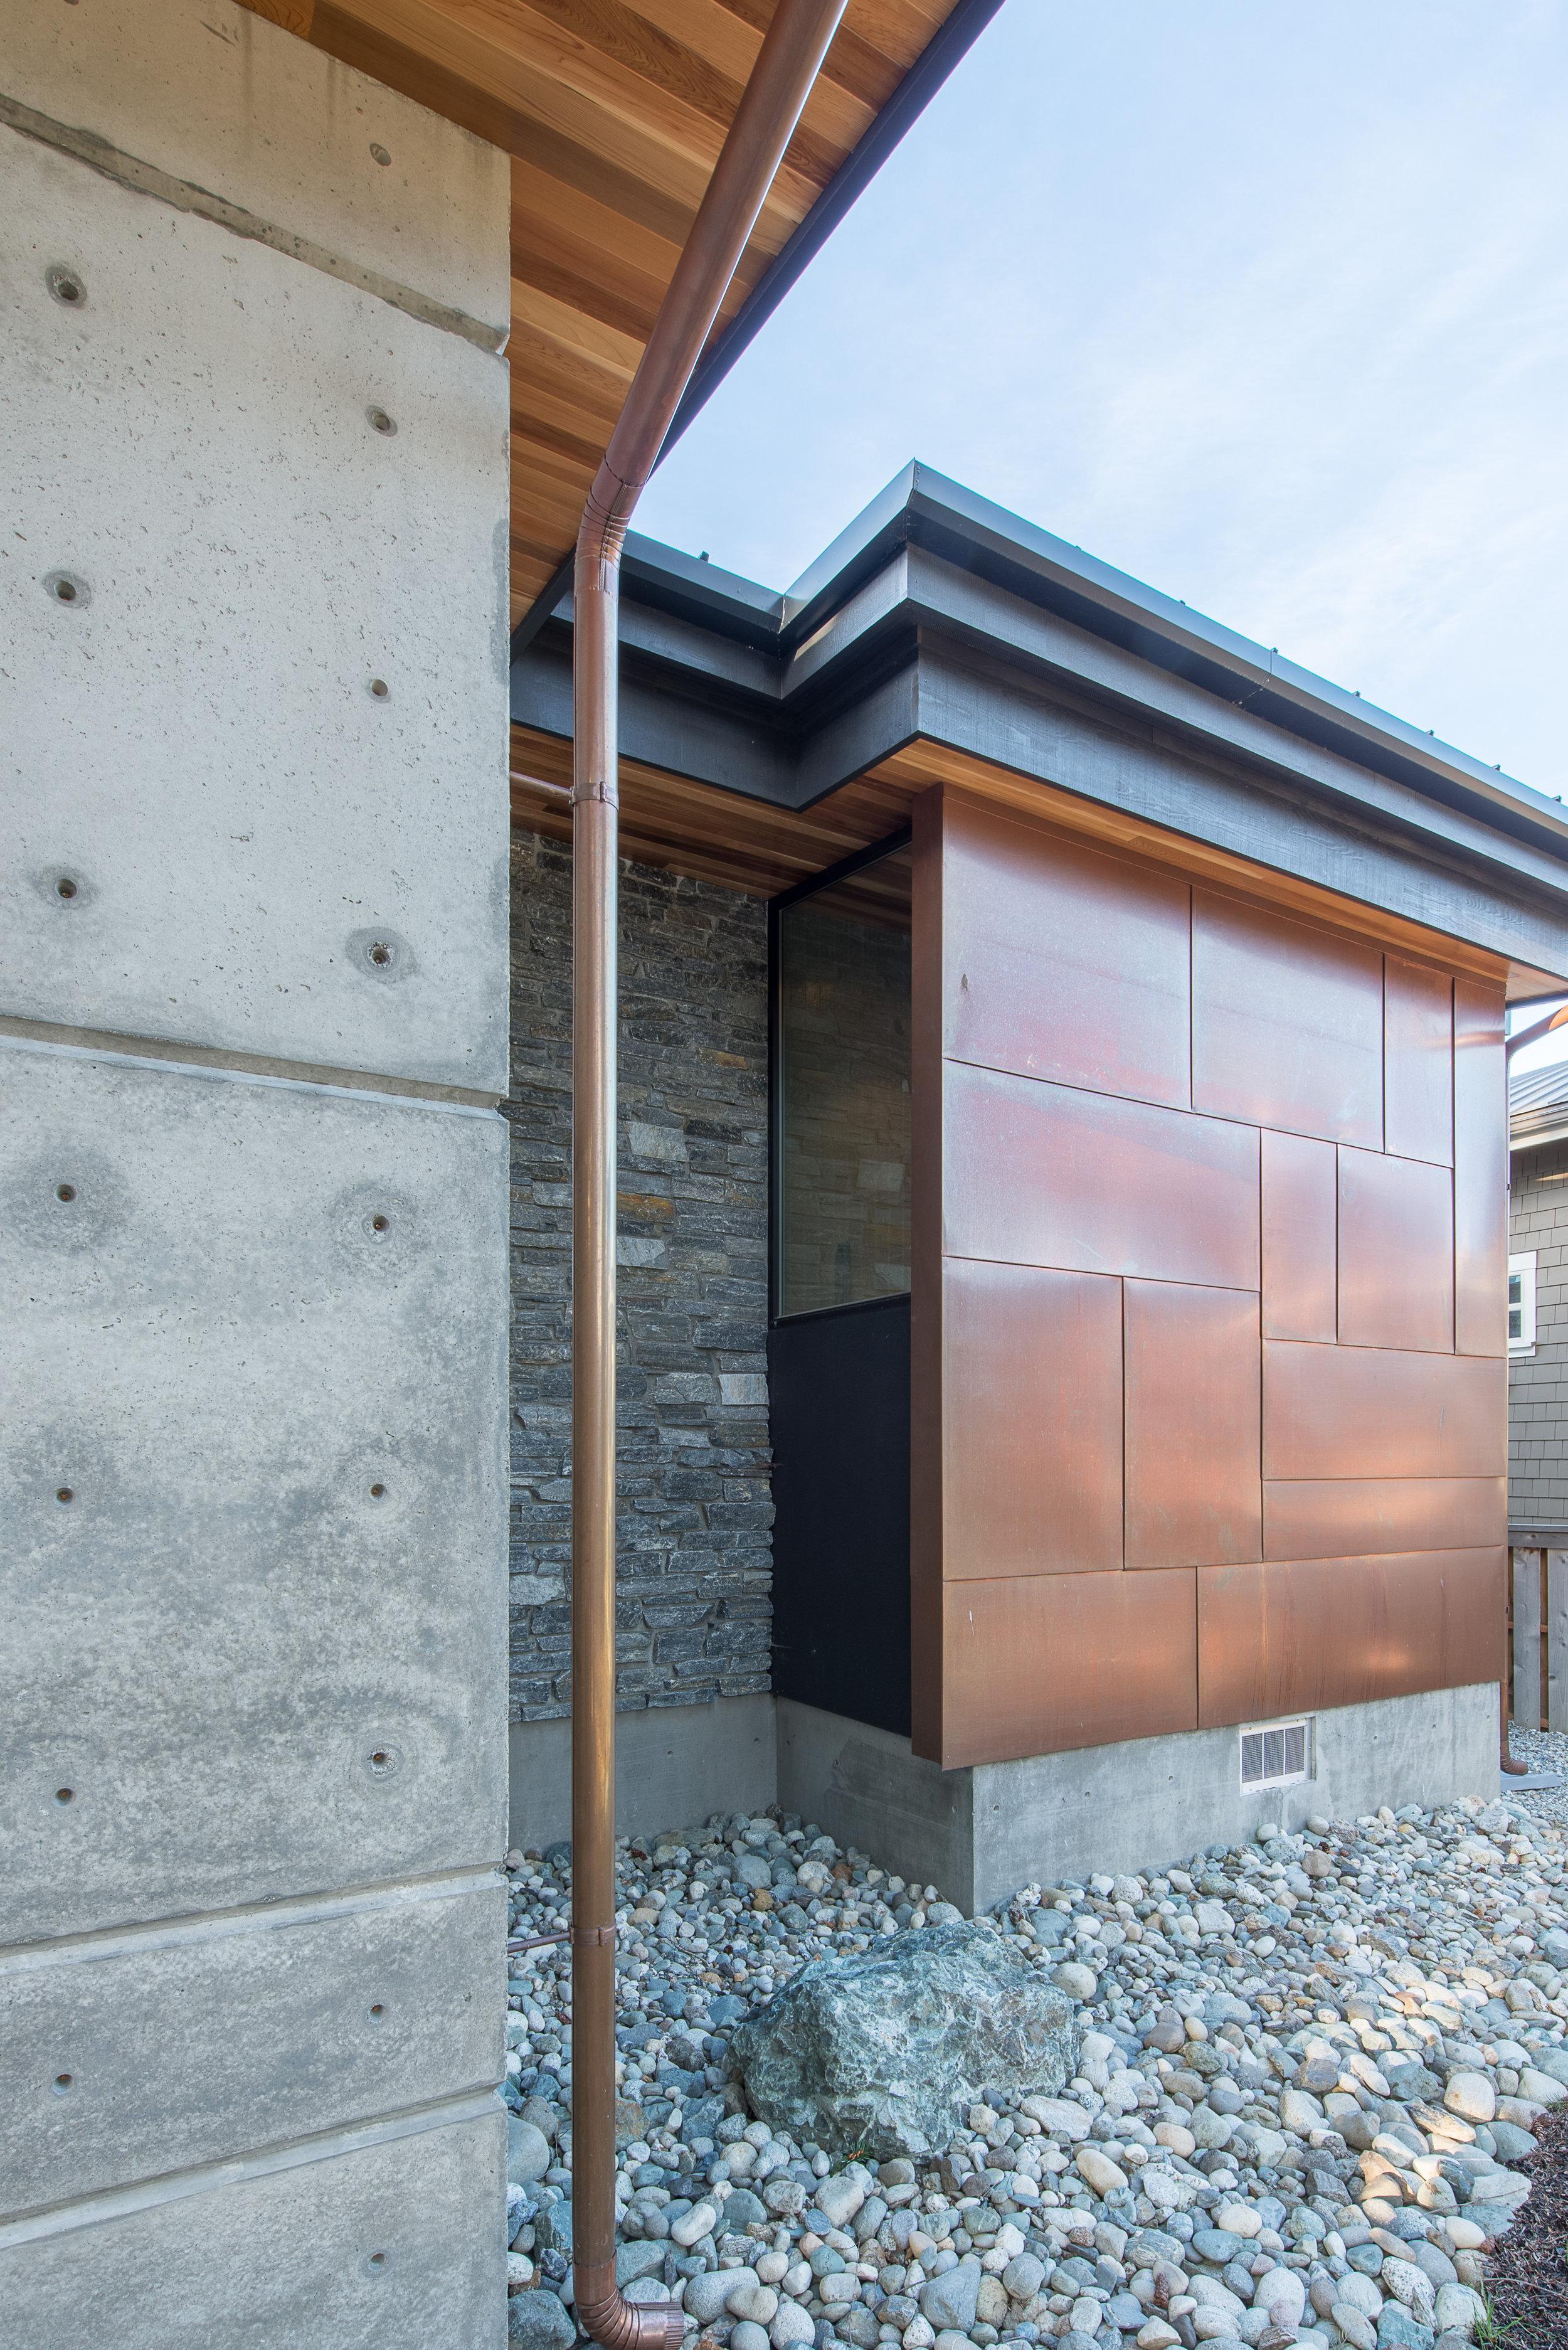 06 - Camano Beach Drive House 5000px - Swift Studio.jpg